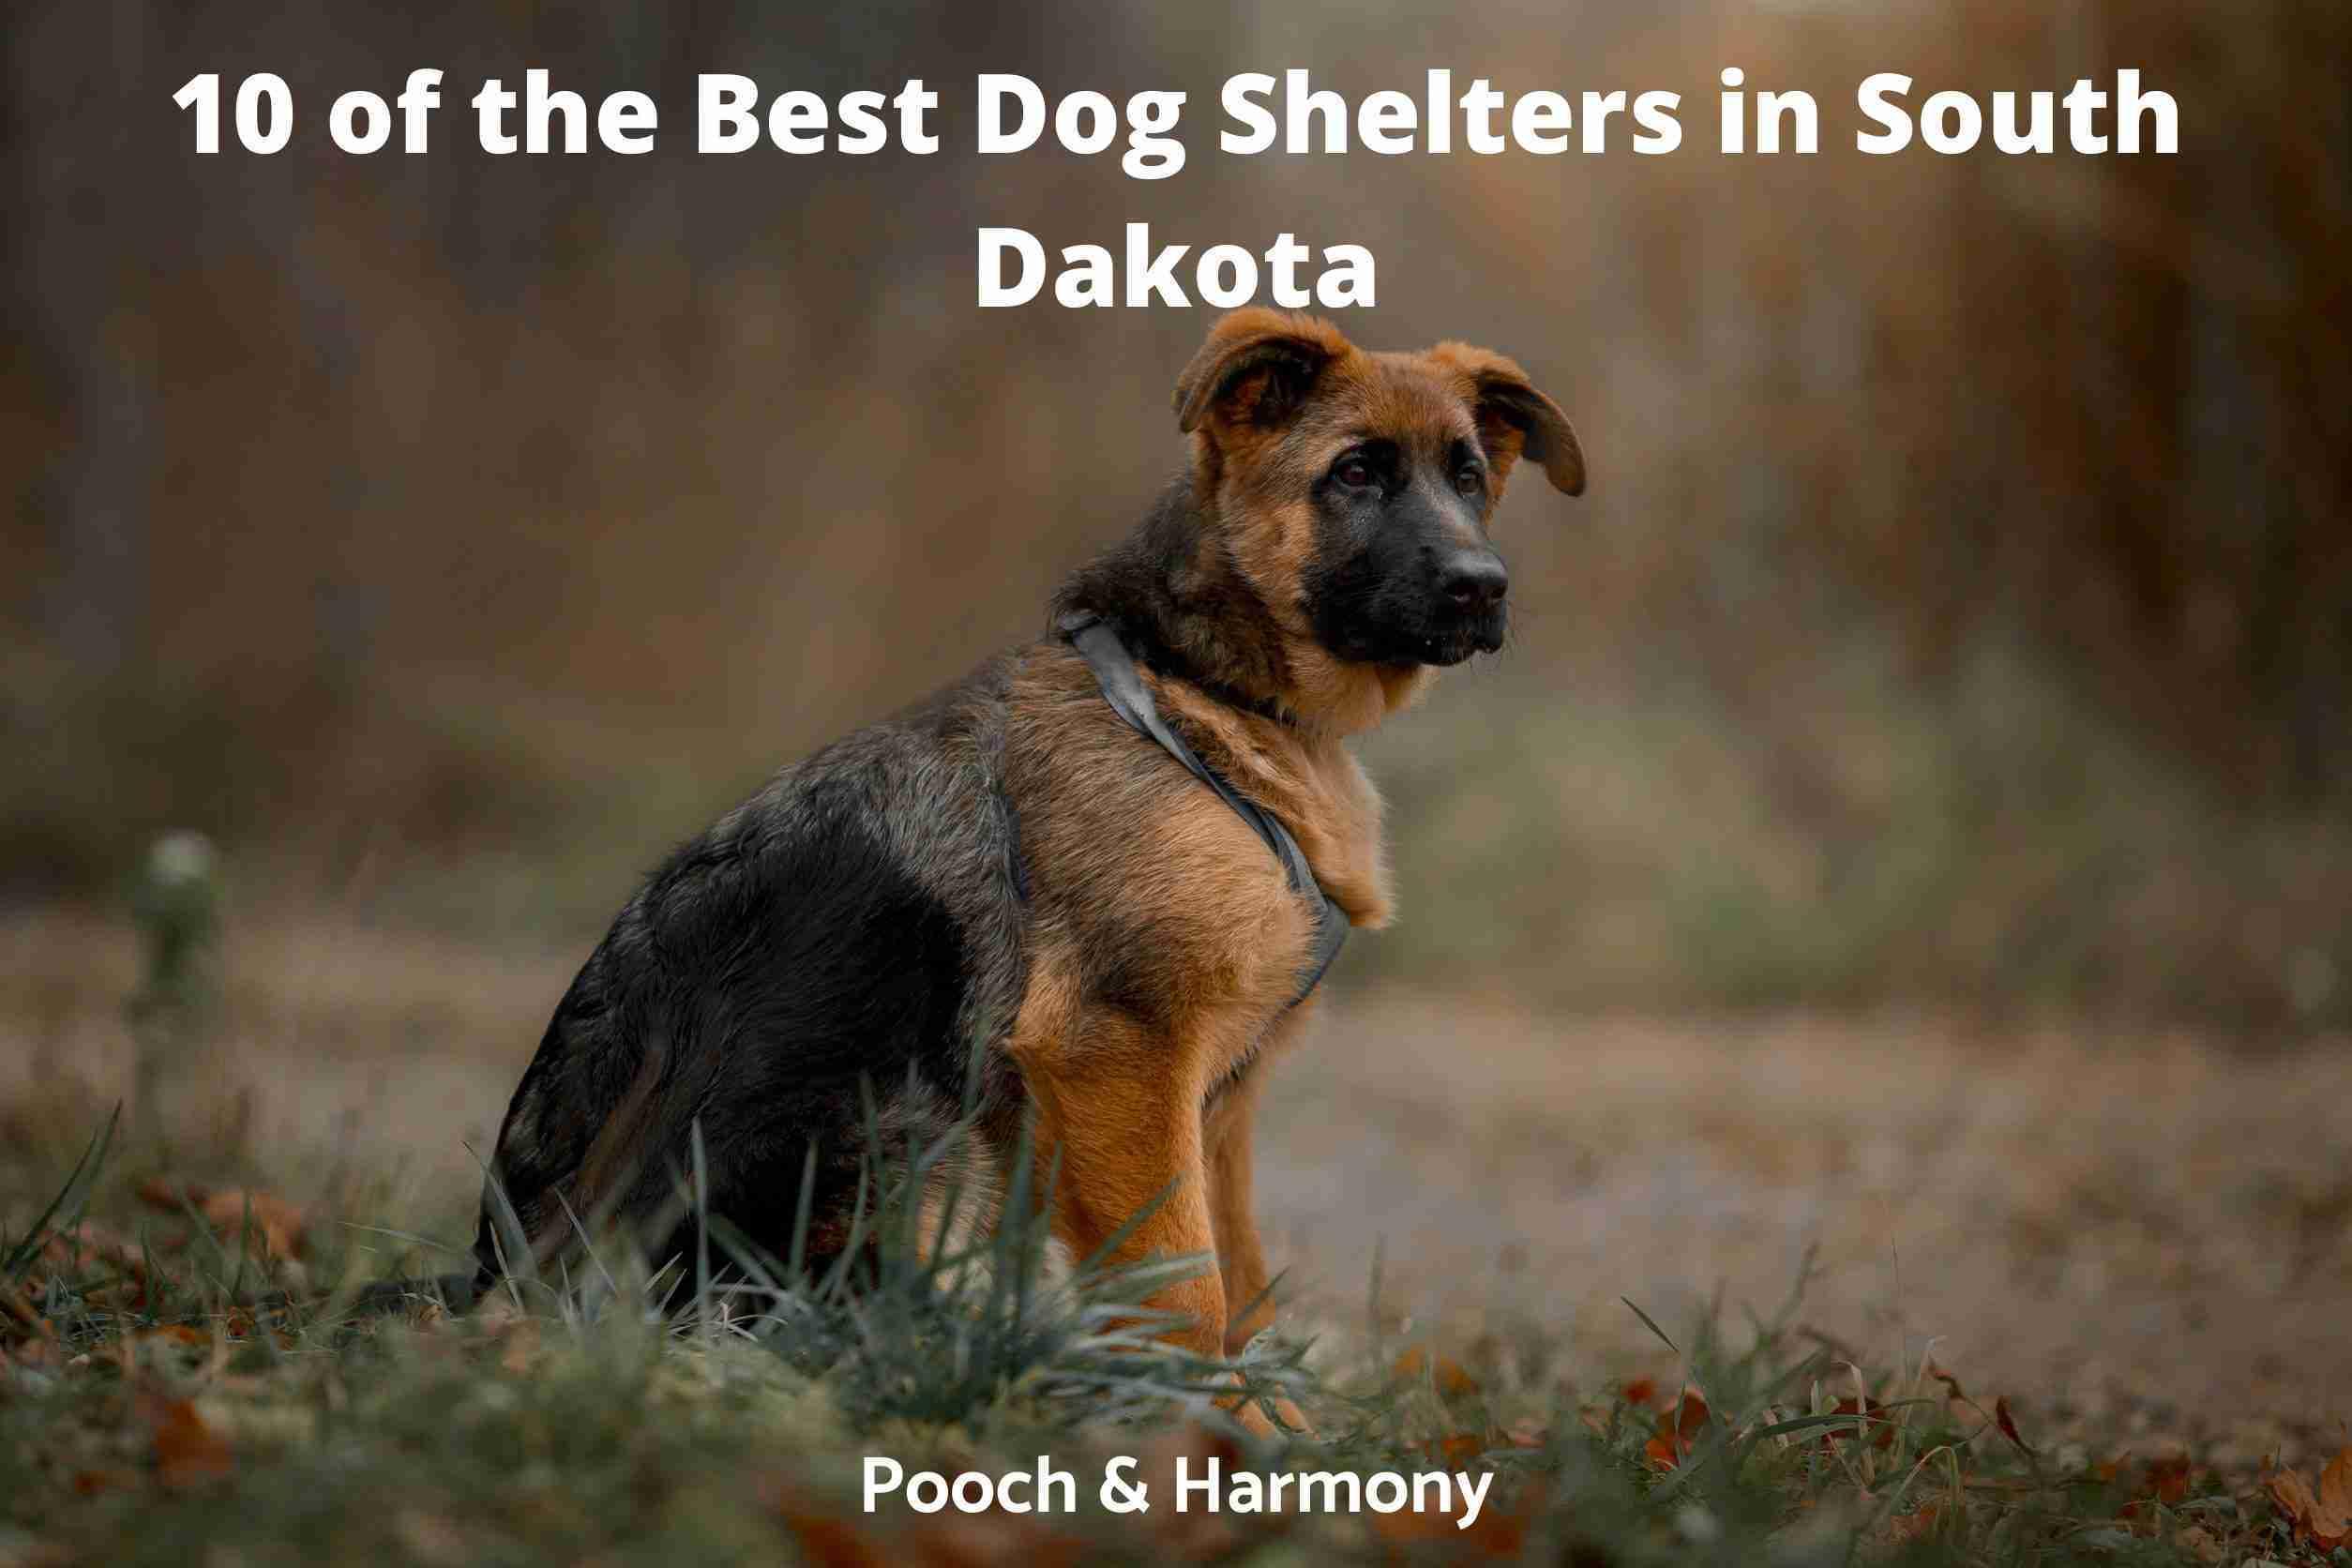 Best Dog Shelters in South Dakota